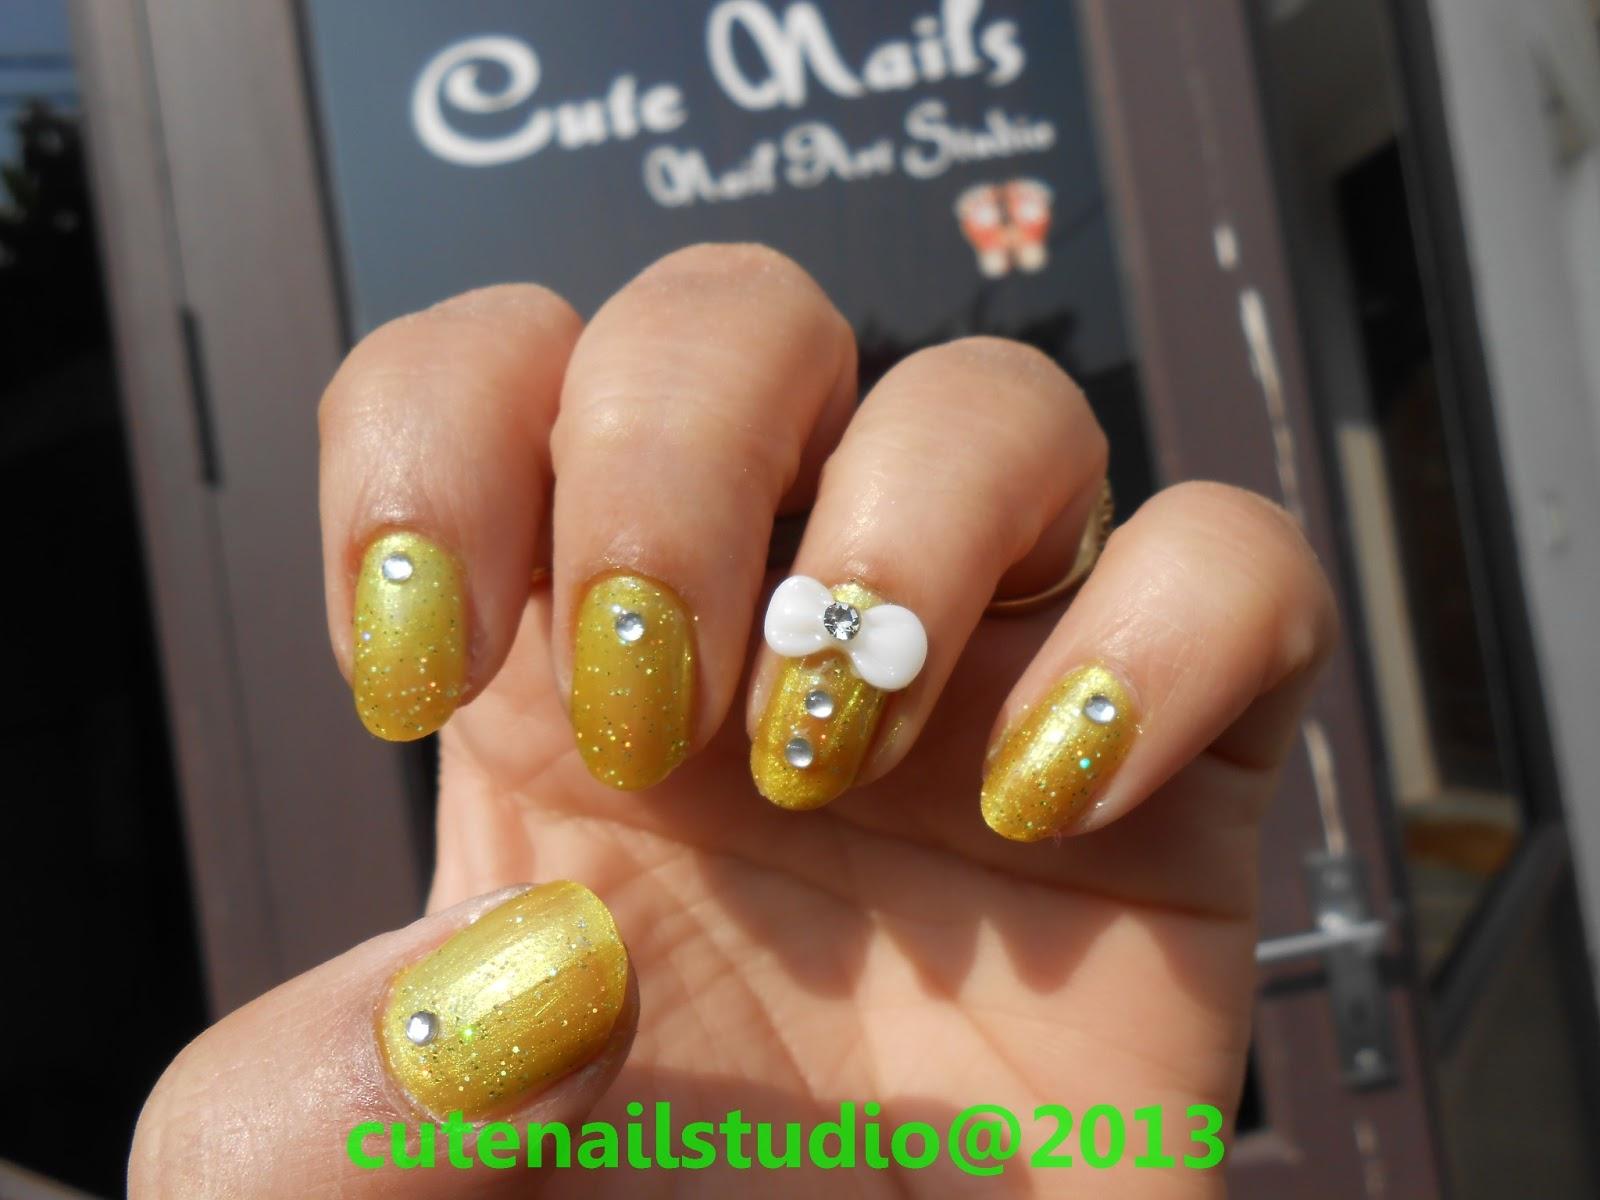 Cute nails 3d bow nail art for 3d nail art salon